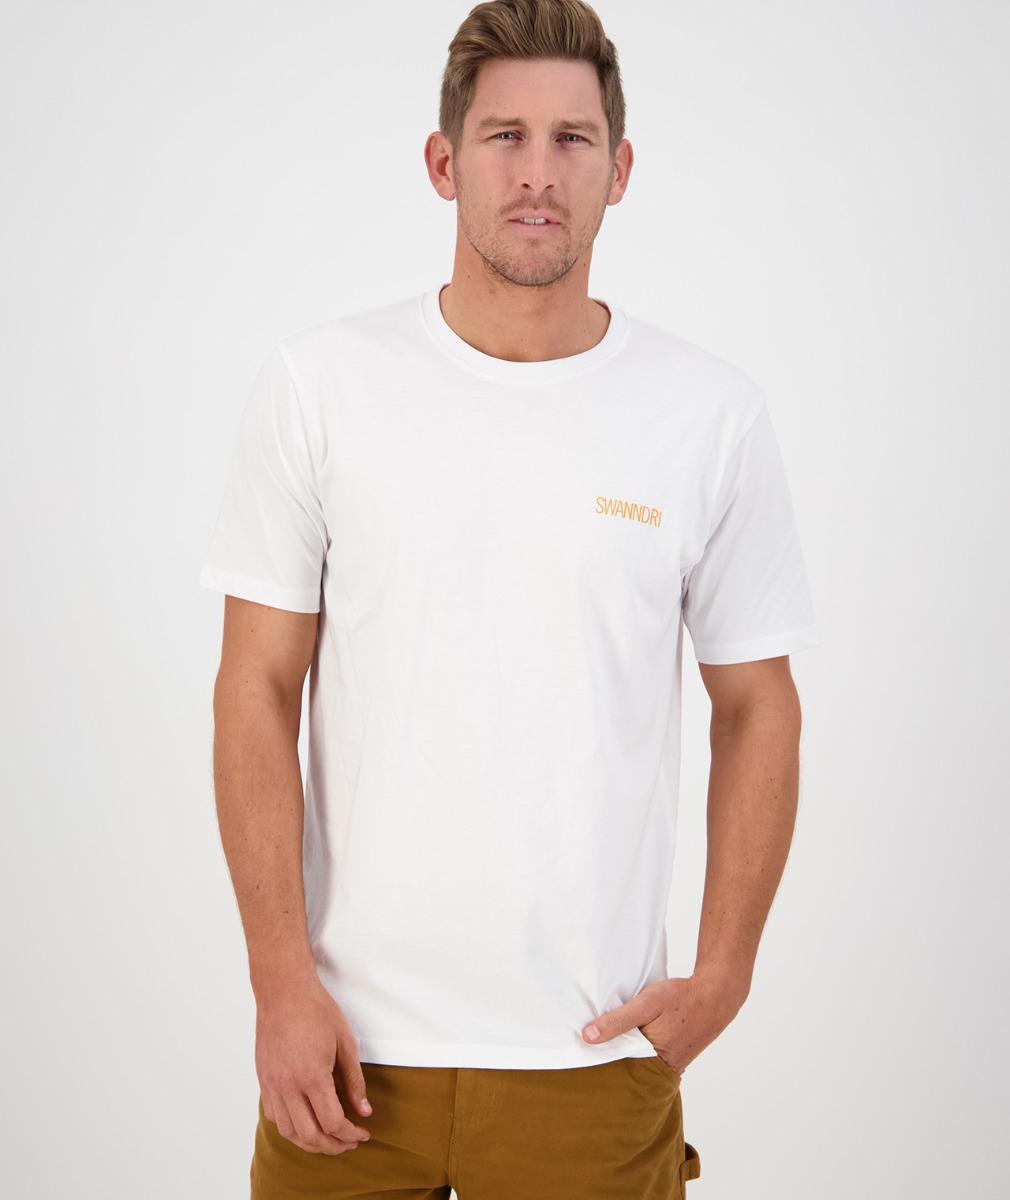 Swanndri Men's The Alps Print Tee in Off White/Navy